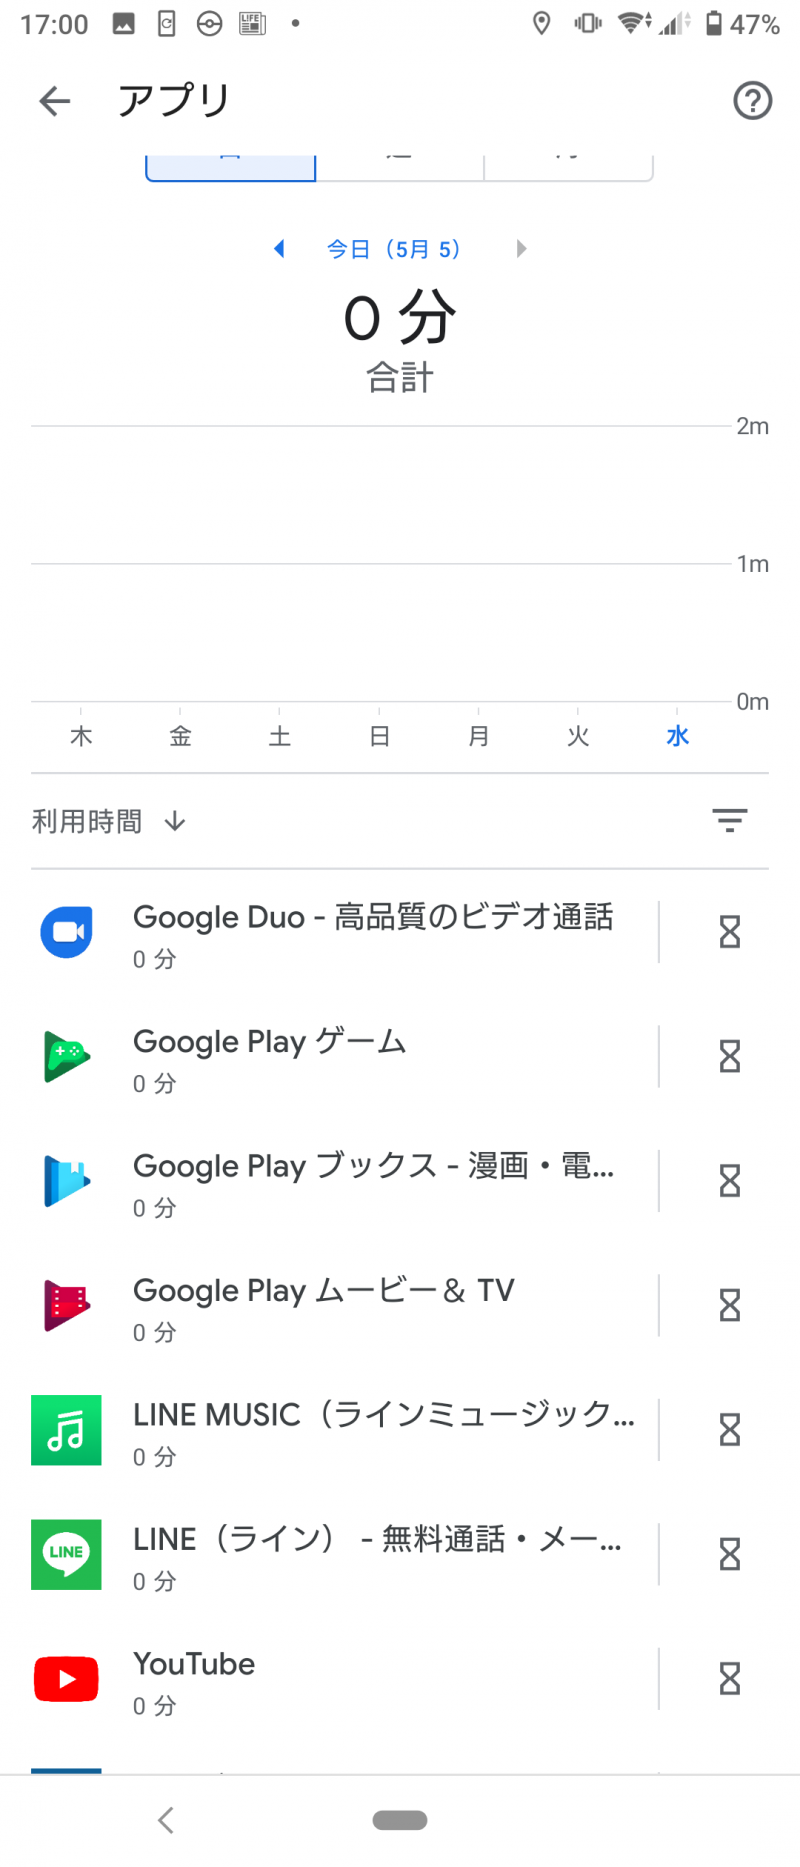 Googleファミリーリンクアプリ アプリ毎使用時間の確認